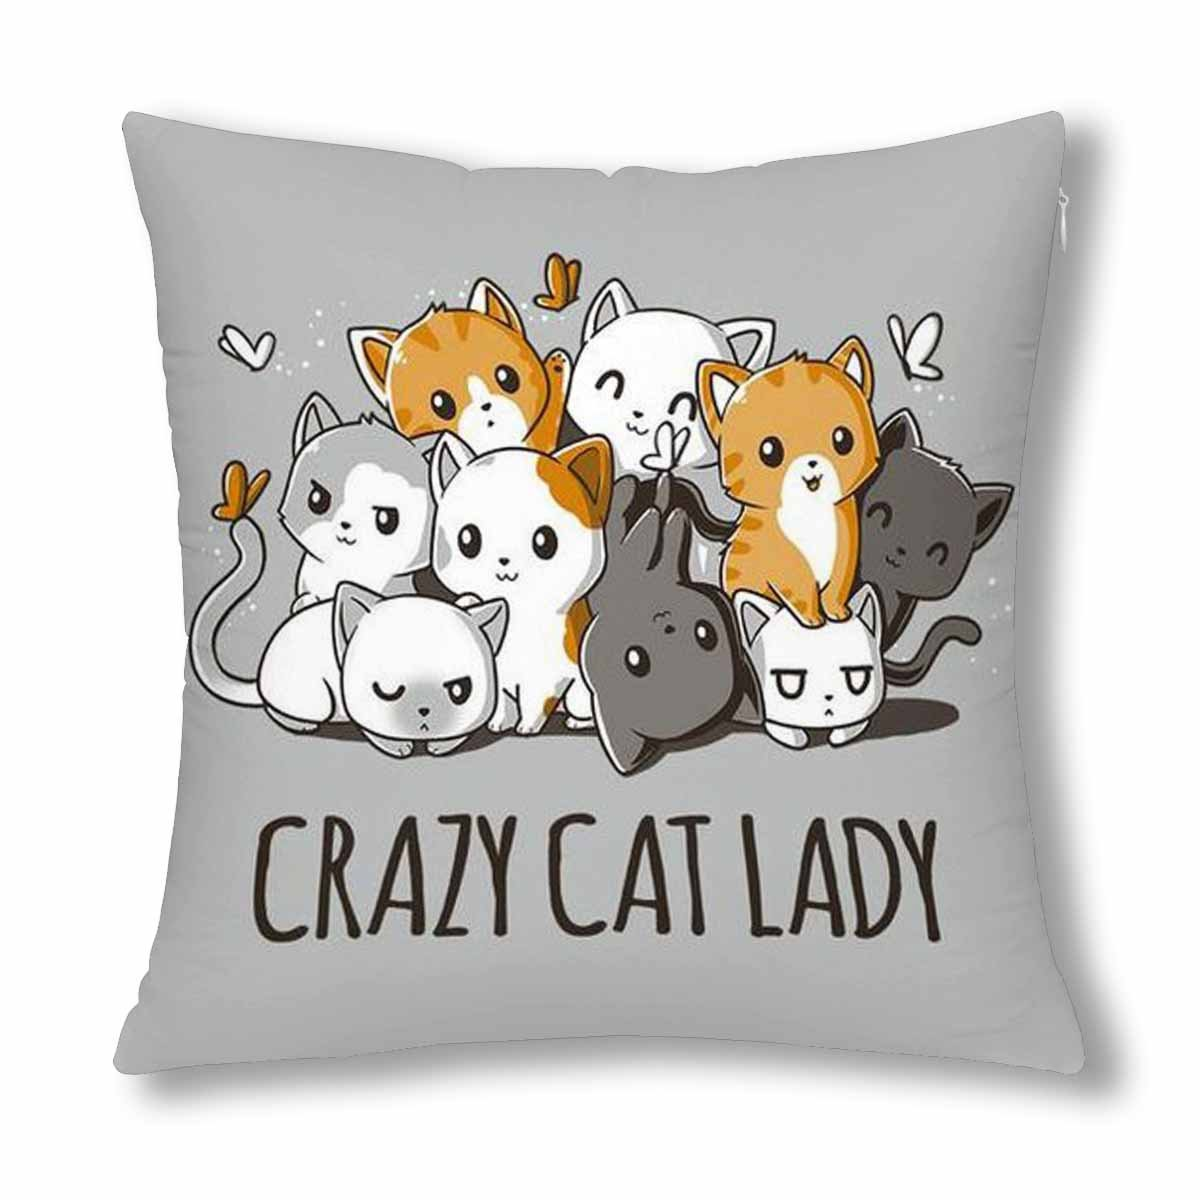 interestprint Crazy Cat Ladyクッションカバー18 新登場